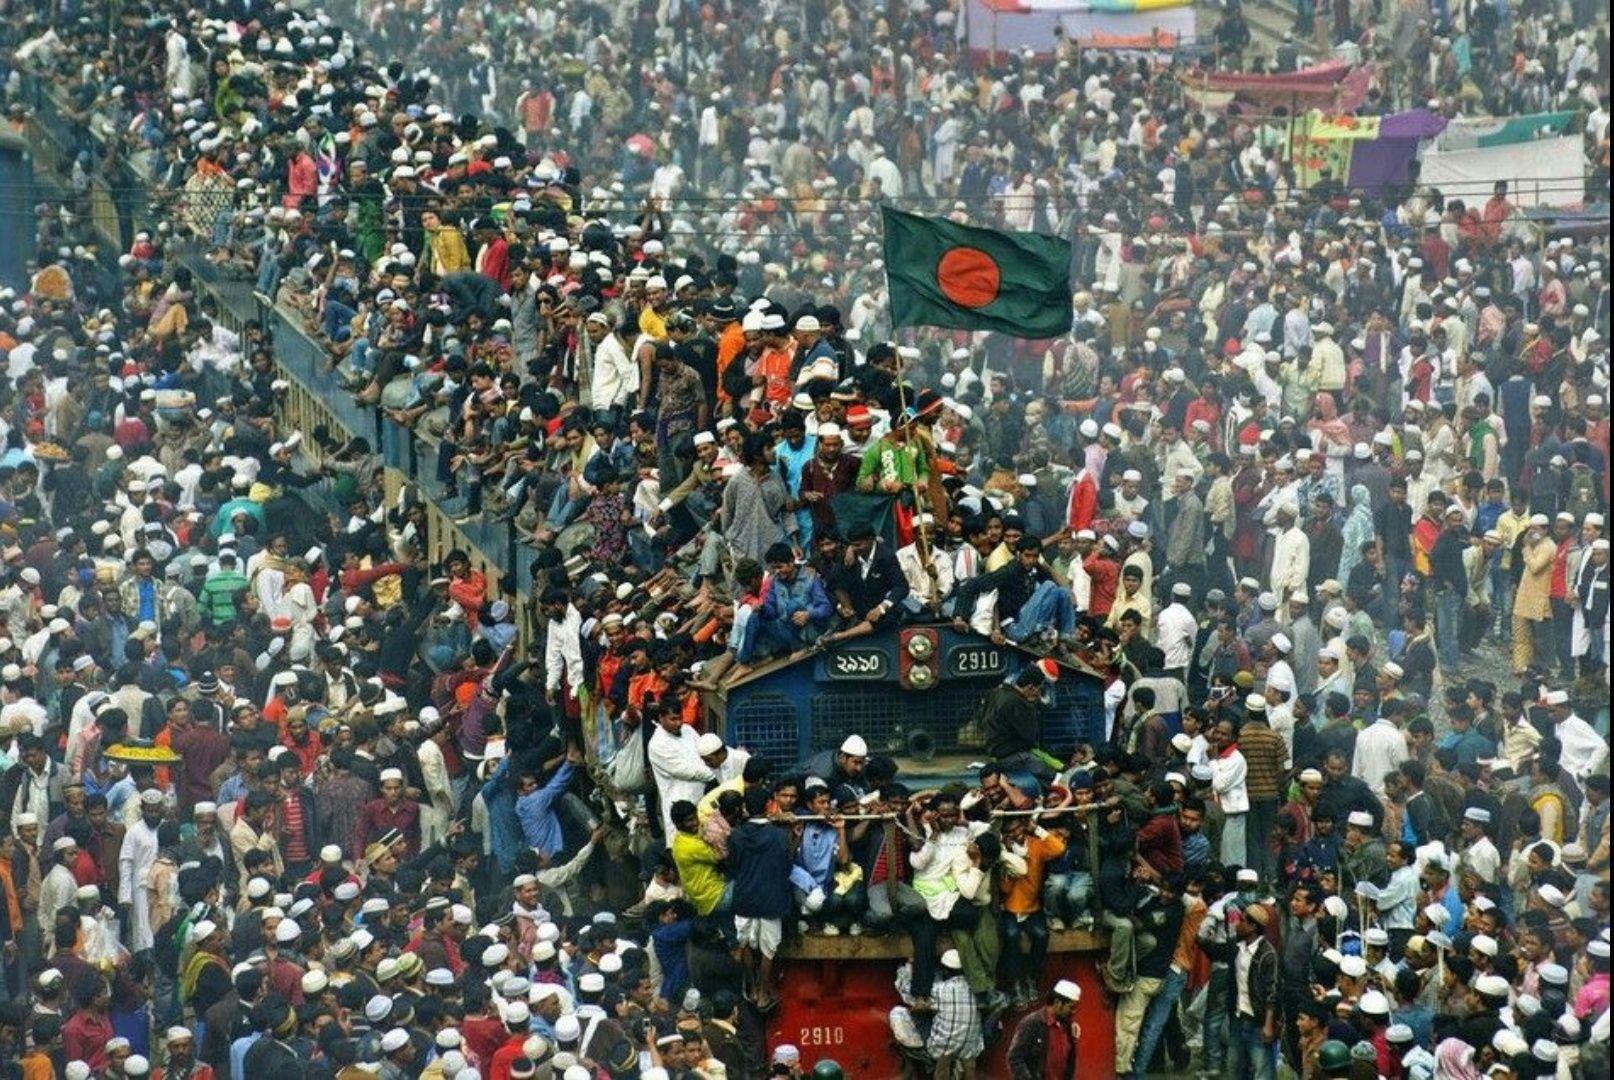 That S Cute Se Sao Paulo Here S Dhaka Bangladesh Train Rides Photo Dhaka Bangladesh